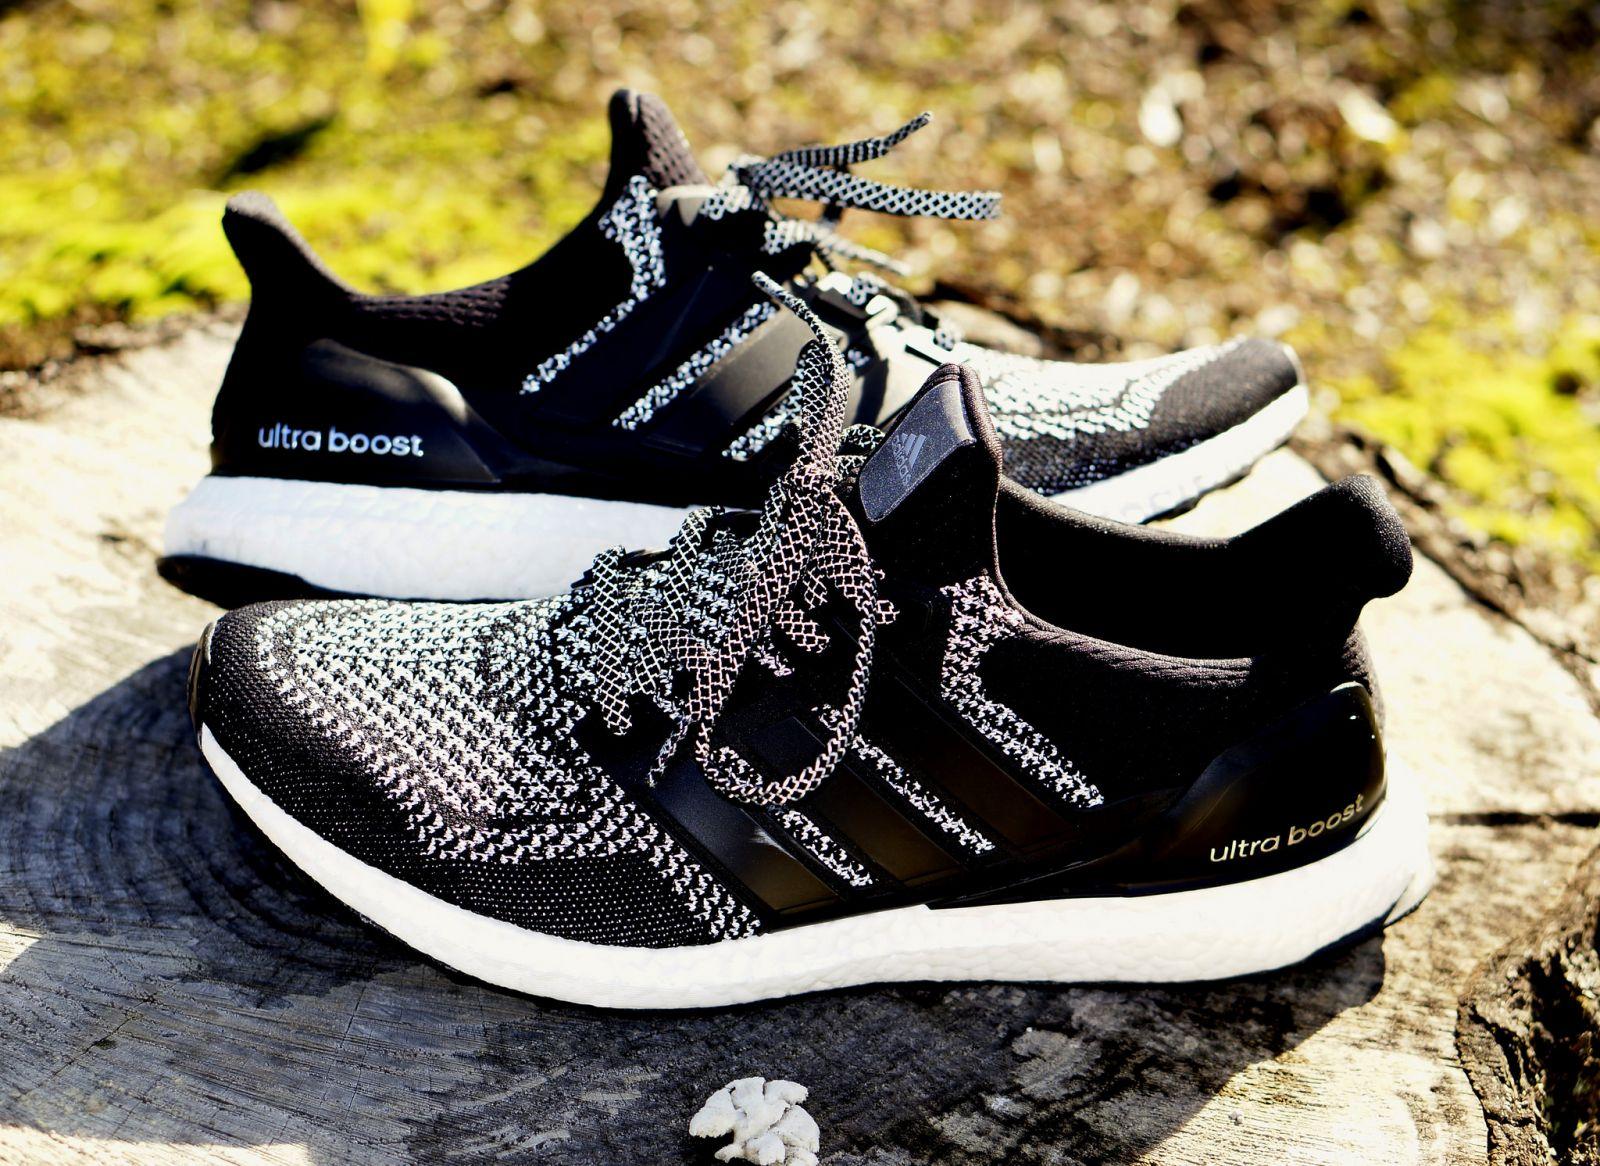 fa29831ddd1d4 best price adidas ultra boost 3m for sale b4d0d bdfb5